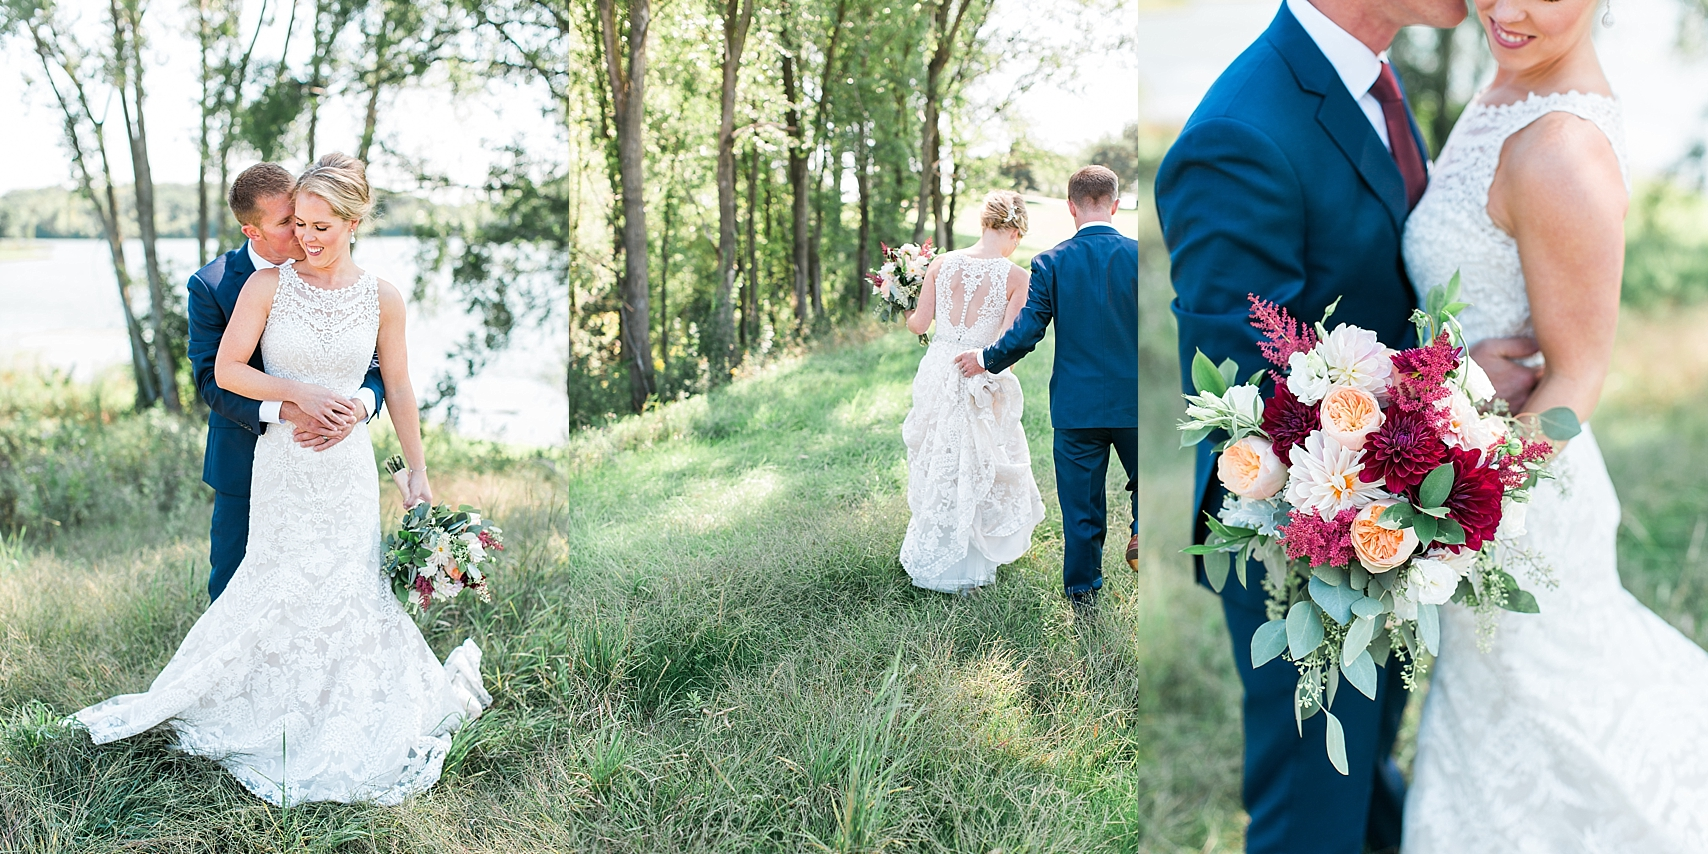 Minnesota Minneapolis Wedding Photographer Best Of 2018 Weddings Mallory Kiesow Photography_0092.jpg